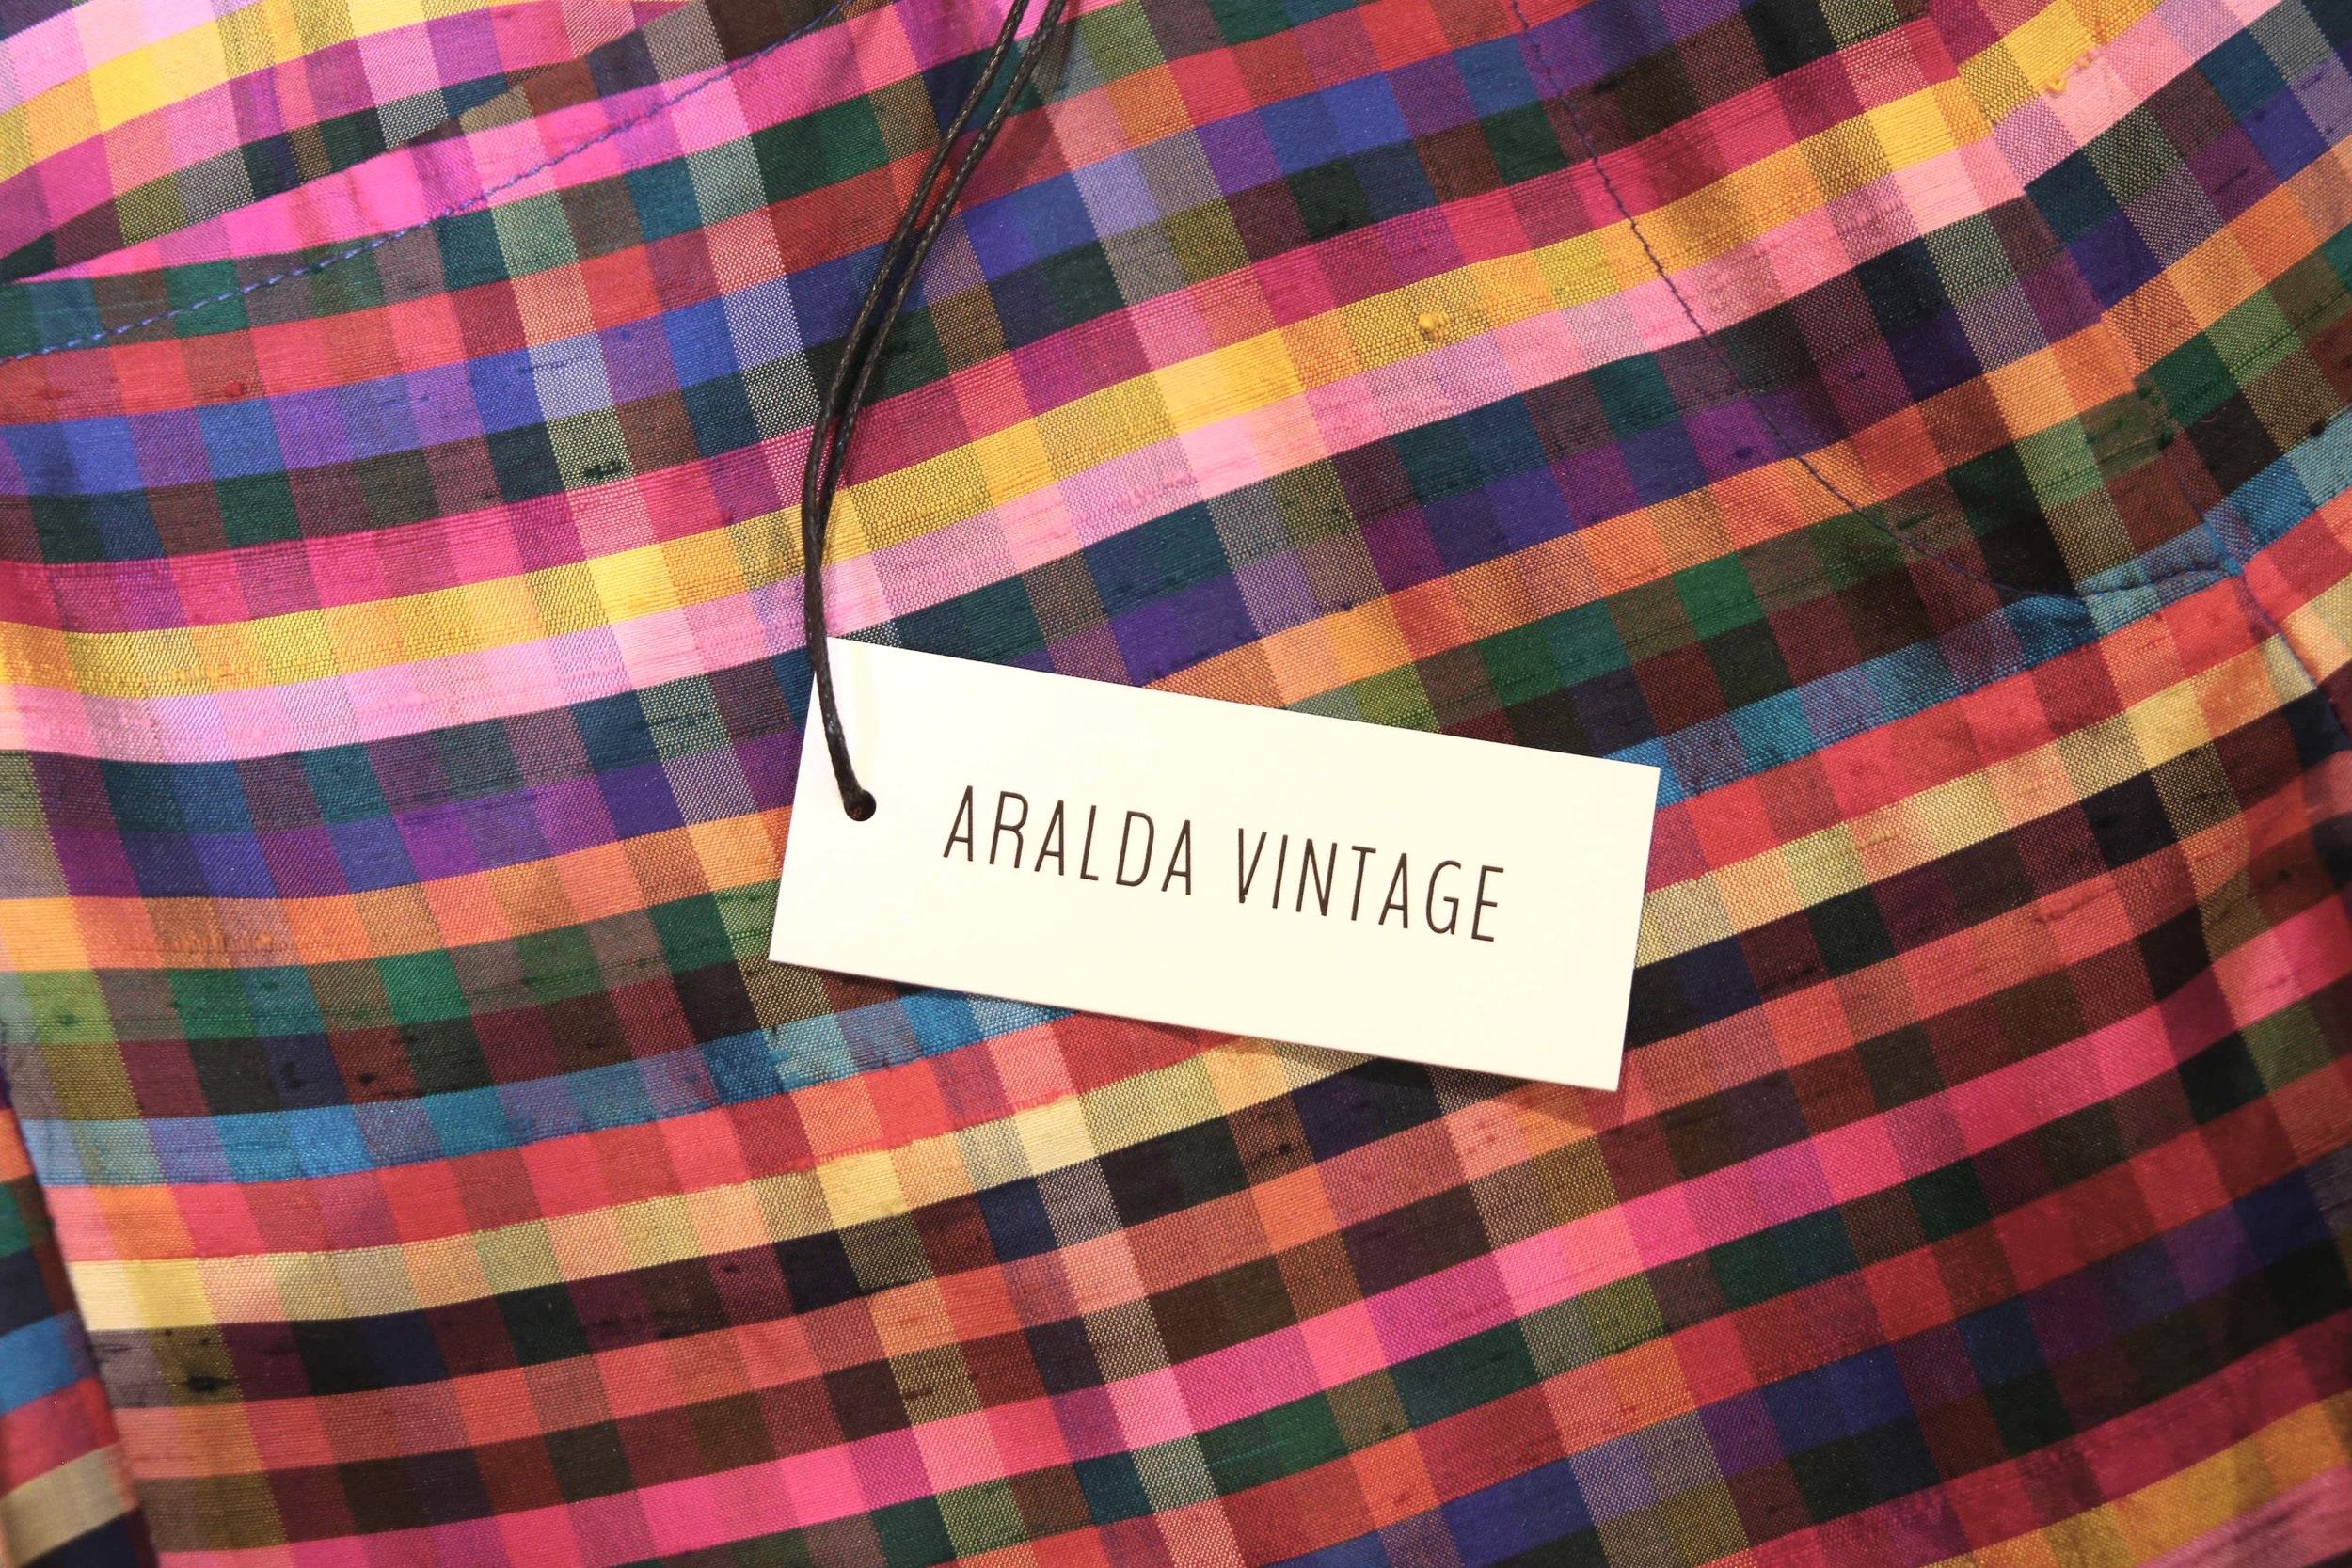 ARALDA VINTAGE [LOGO & Branding]